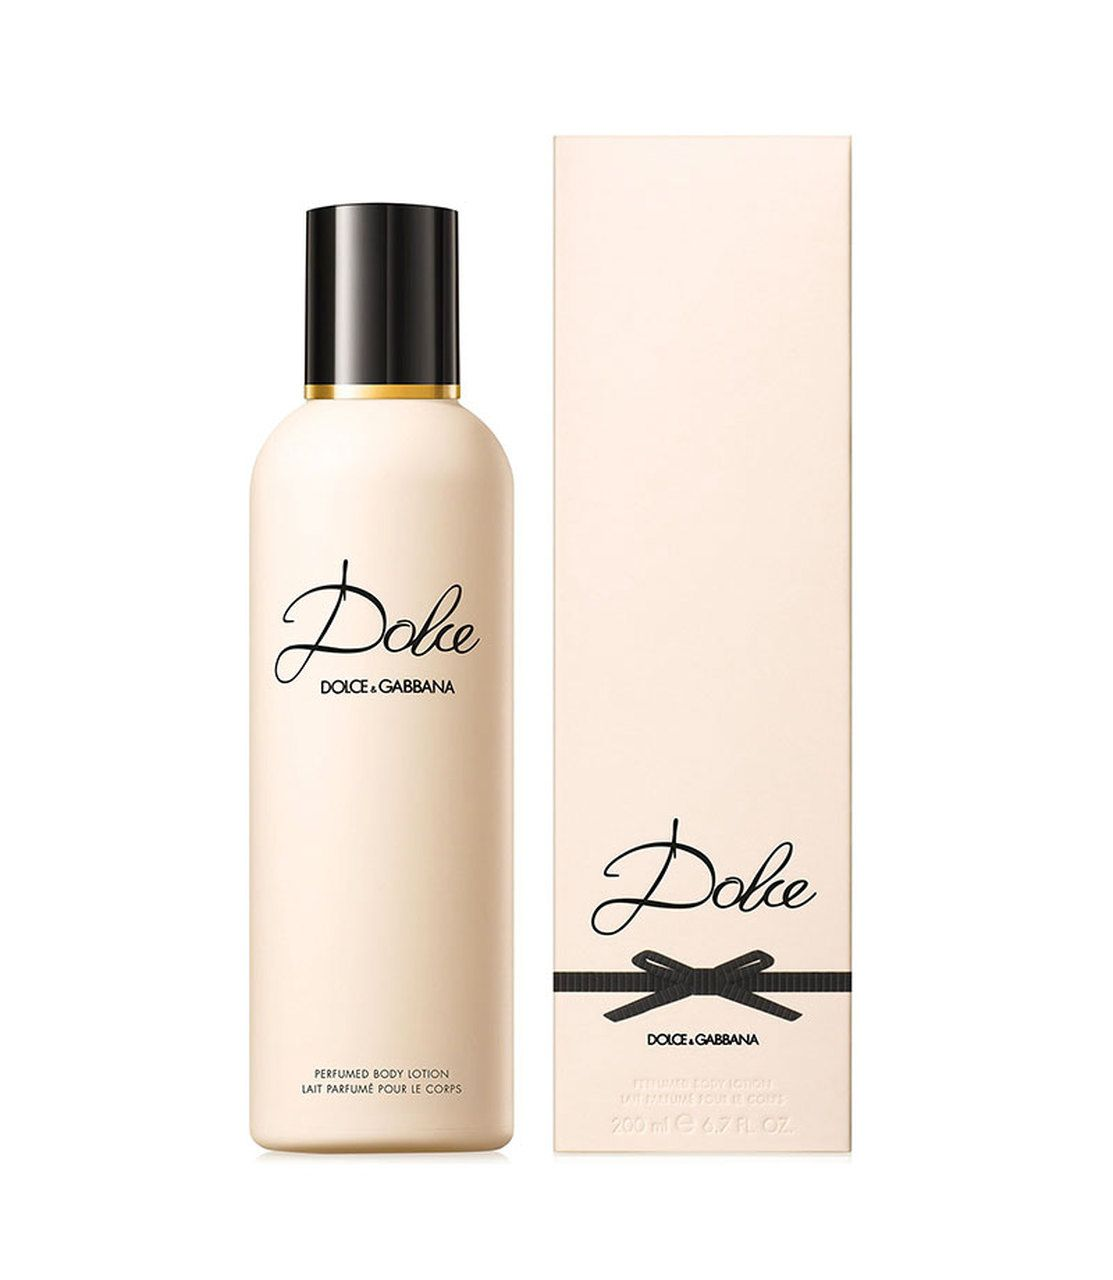 Dolce Gabbana Dolce Body Lotion 6 7 Oz Scented Body Lotion Body Lotion Fragrance Spray